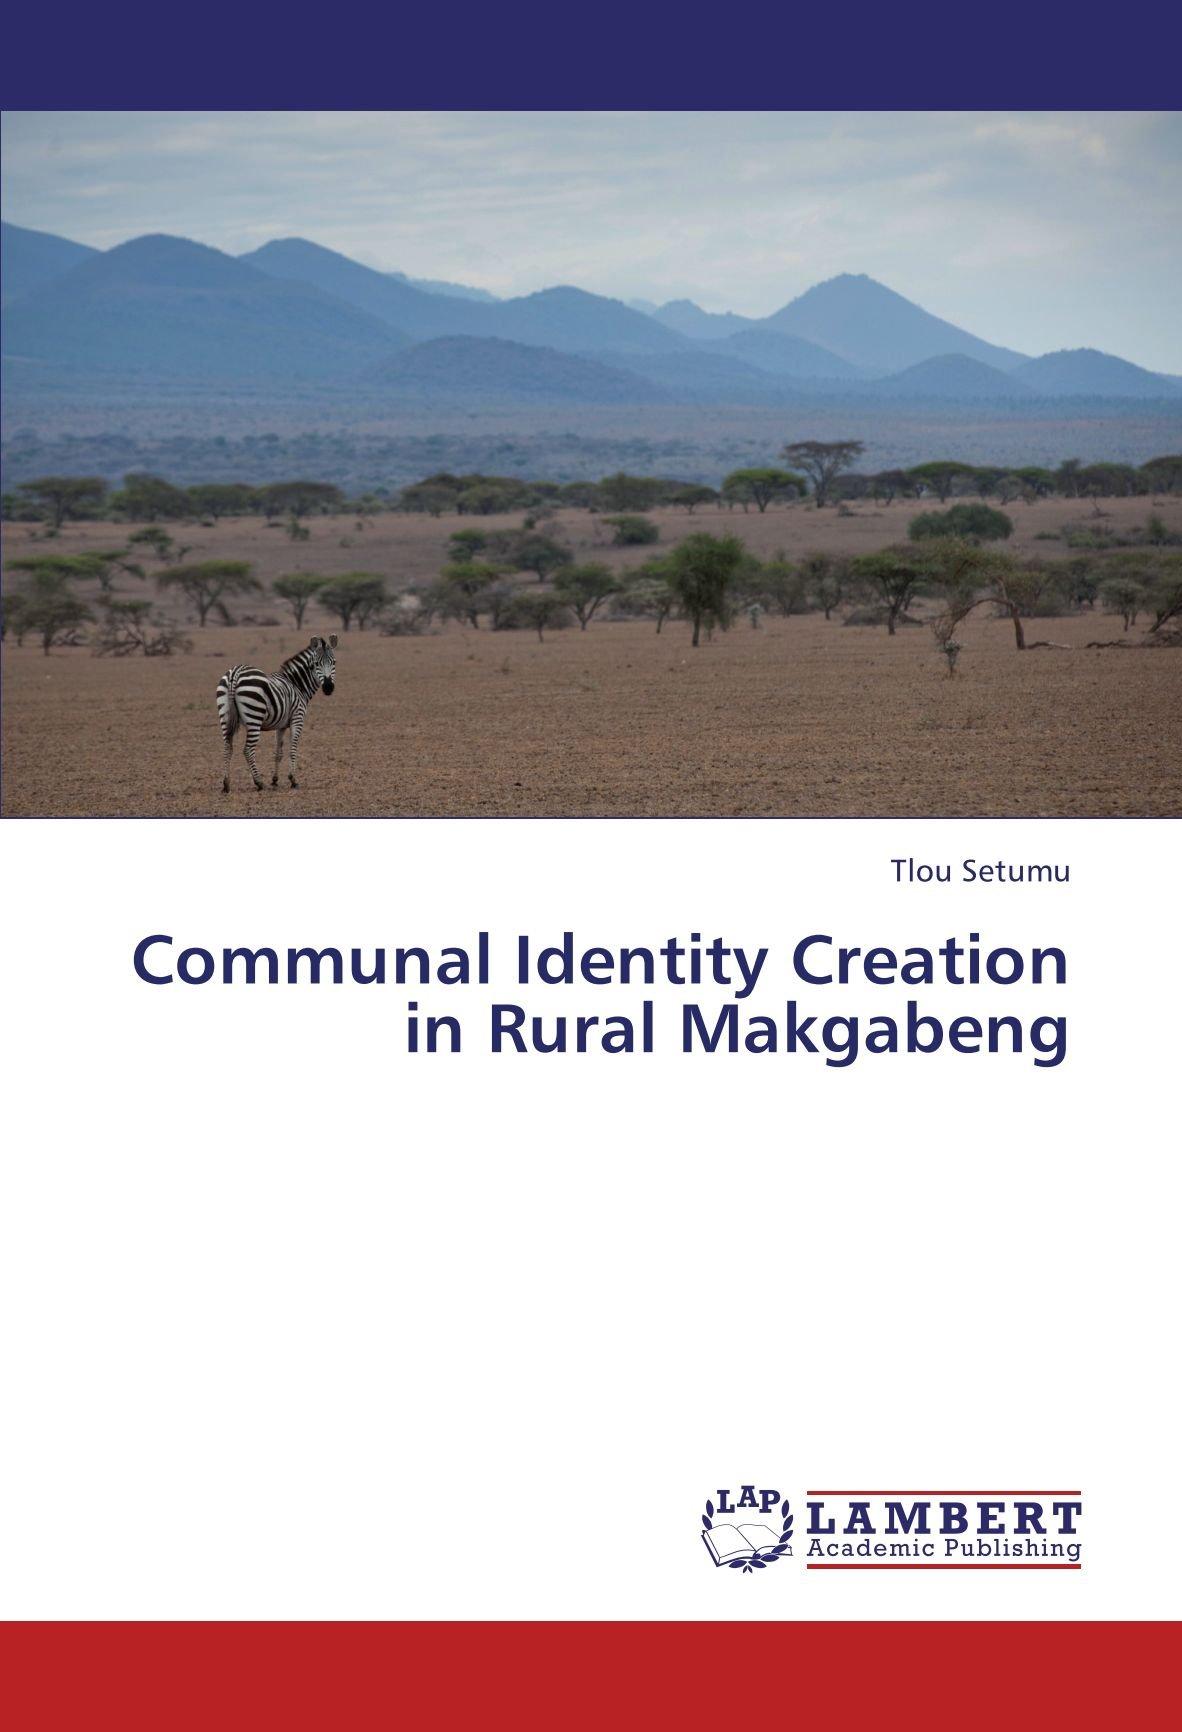 Communal Identity Creation in Rural Makgabeng: Tlou Setumu